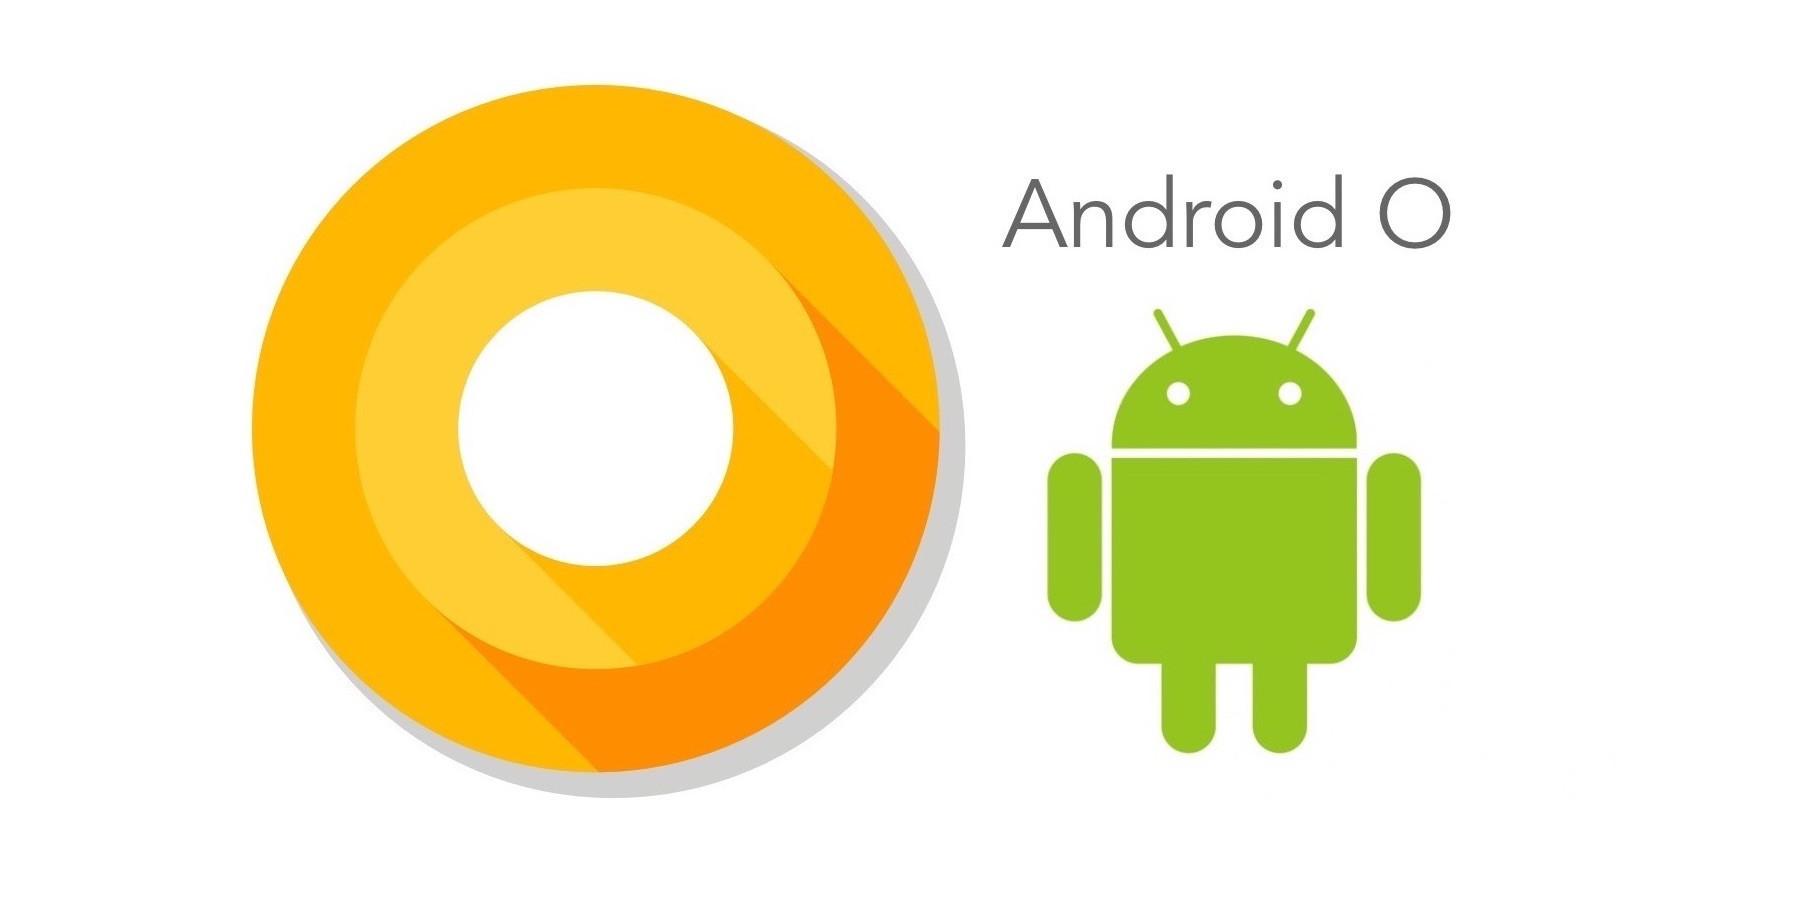 1498633145_android-o-logo-1.jpg